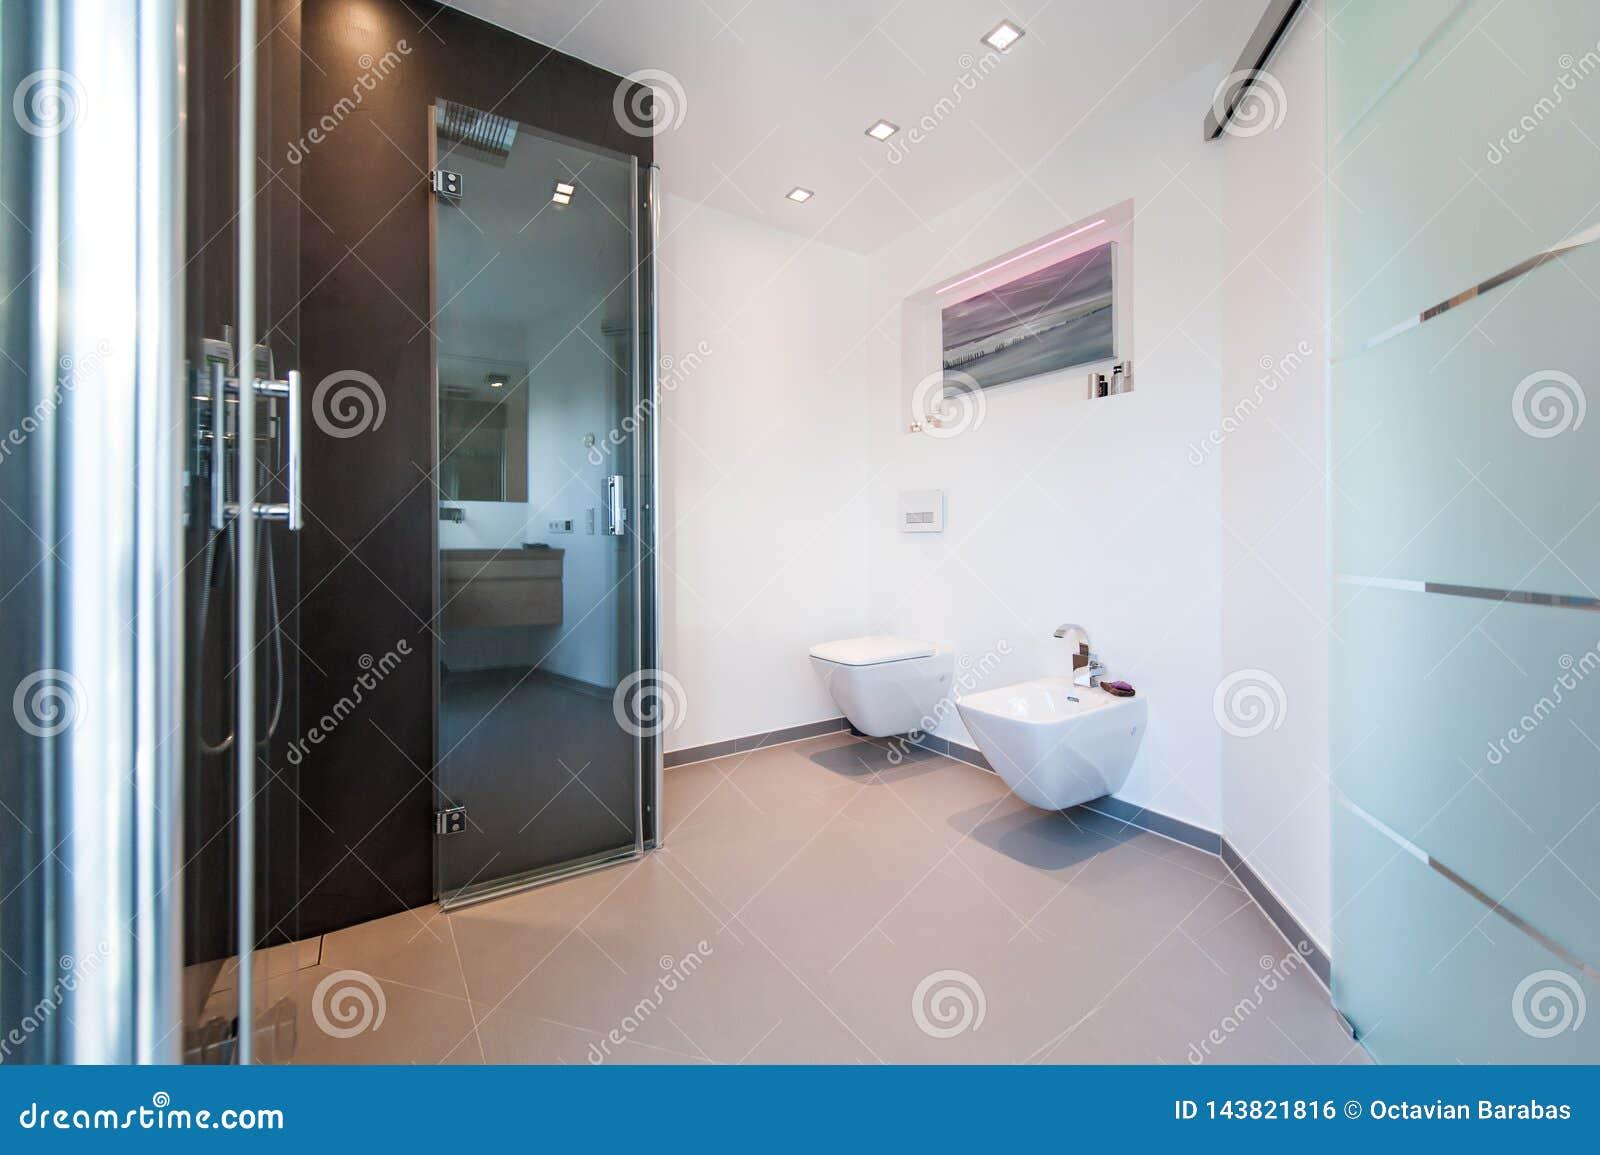 Modern bathroom with glass doors